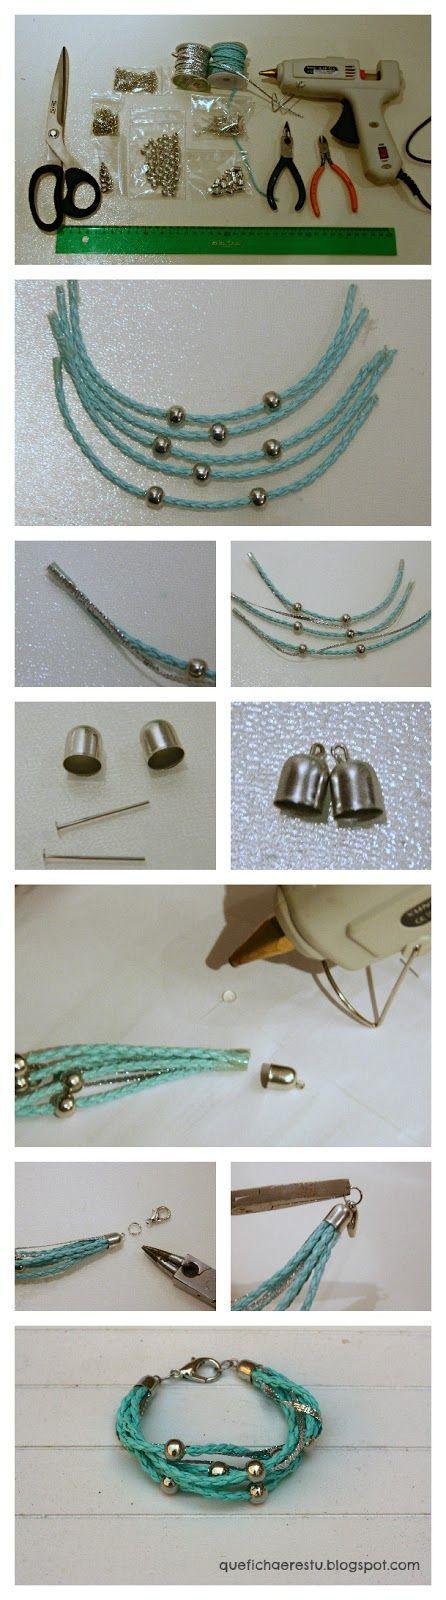 Tutorial DIY Bijoux et Accessoires   Image    Description  DIY- Beatrix bracelet. #Beading #Jewelry #Tutorials